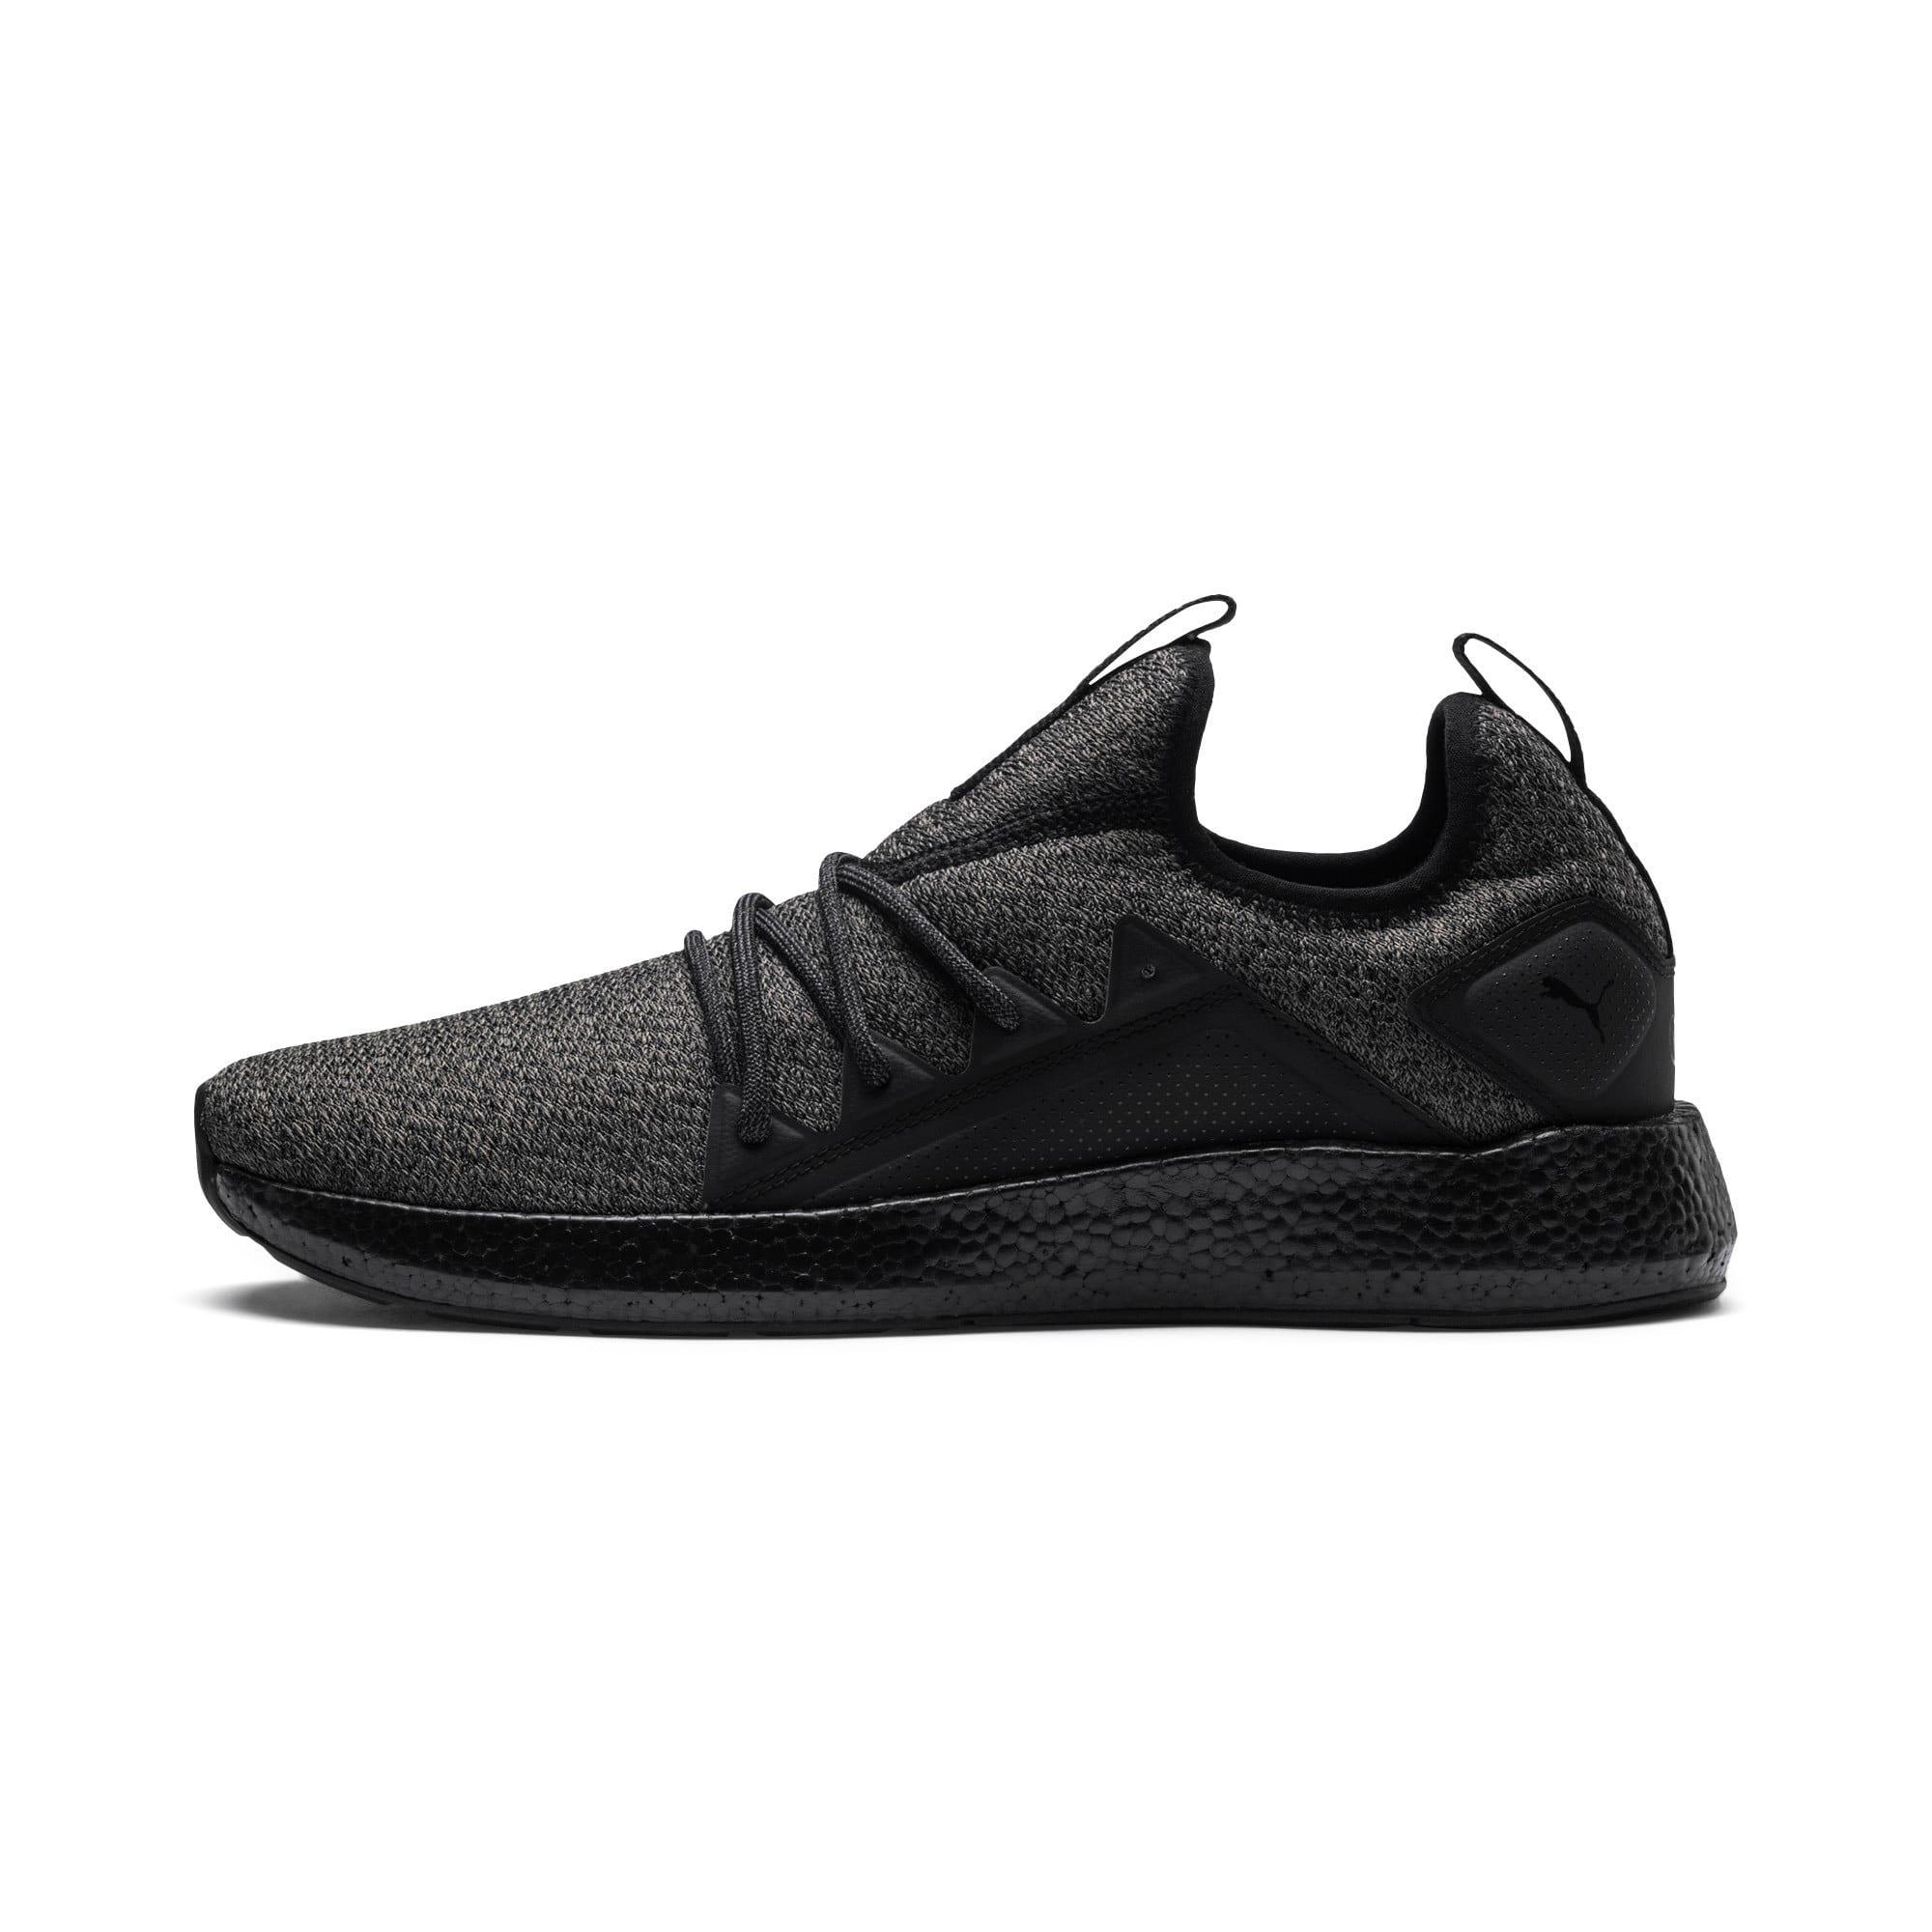 Thumbnail 1 of NRGY Neko Knit Men's Running Shoes, Puma Black-Puma Black, medium